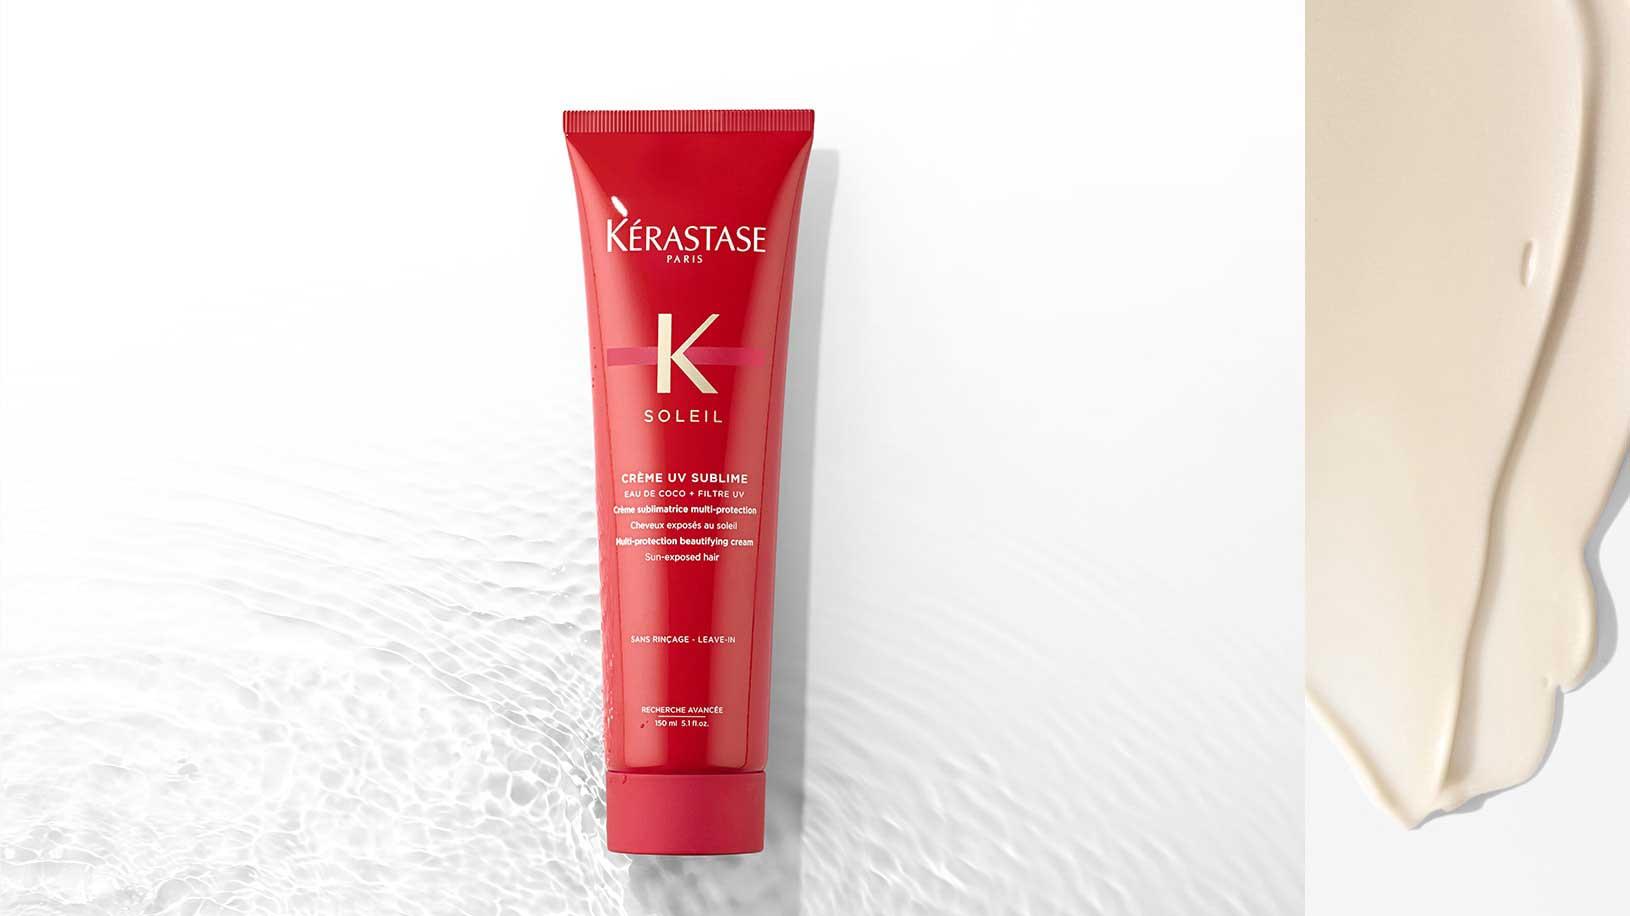 Kerastase Soleil Crème UV Sublime Hair Cream